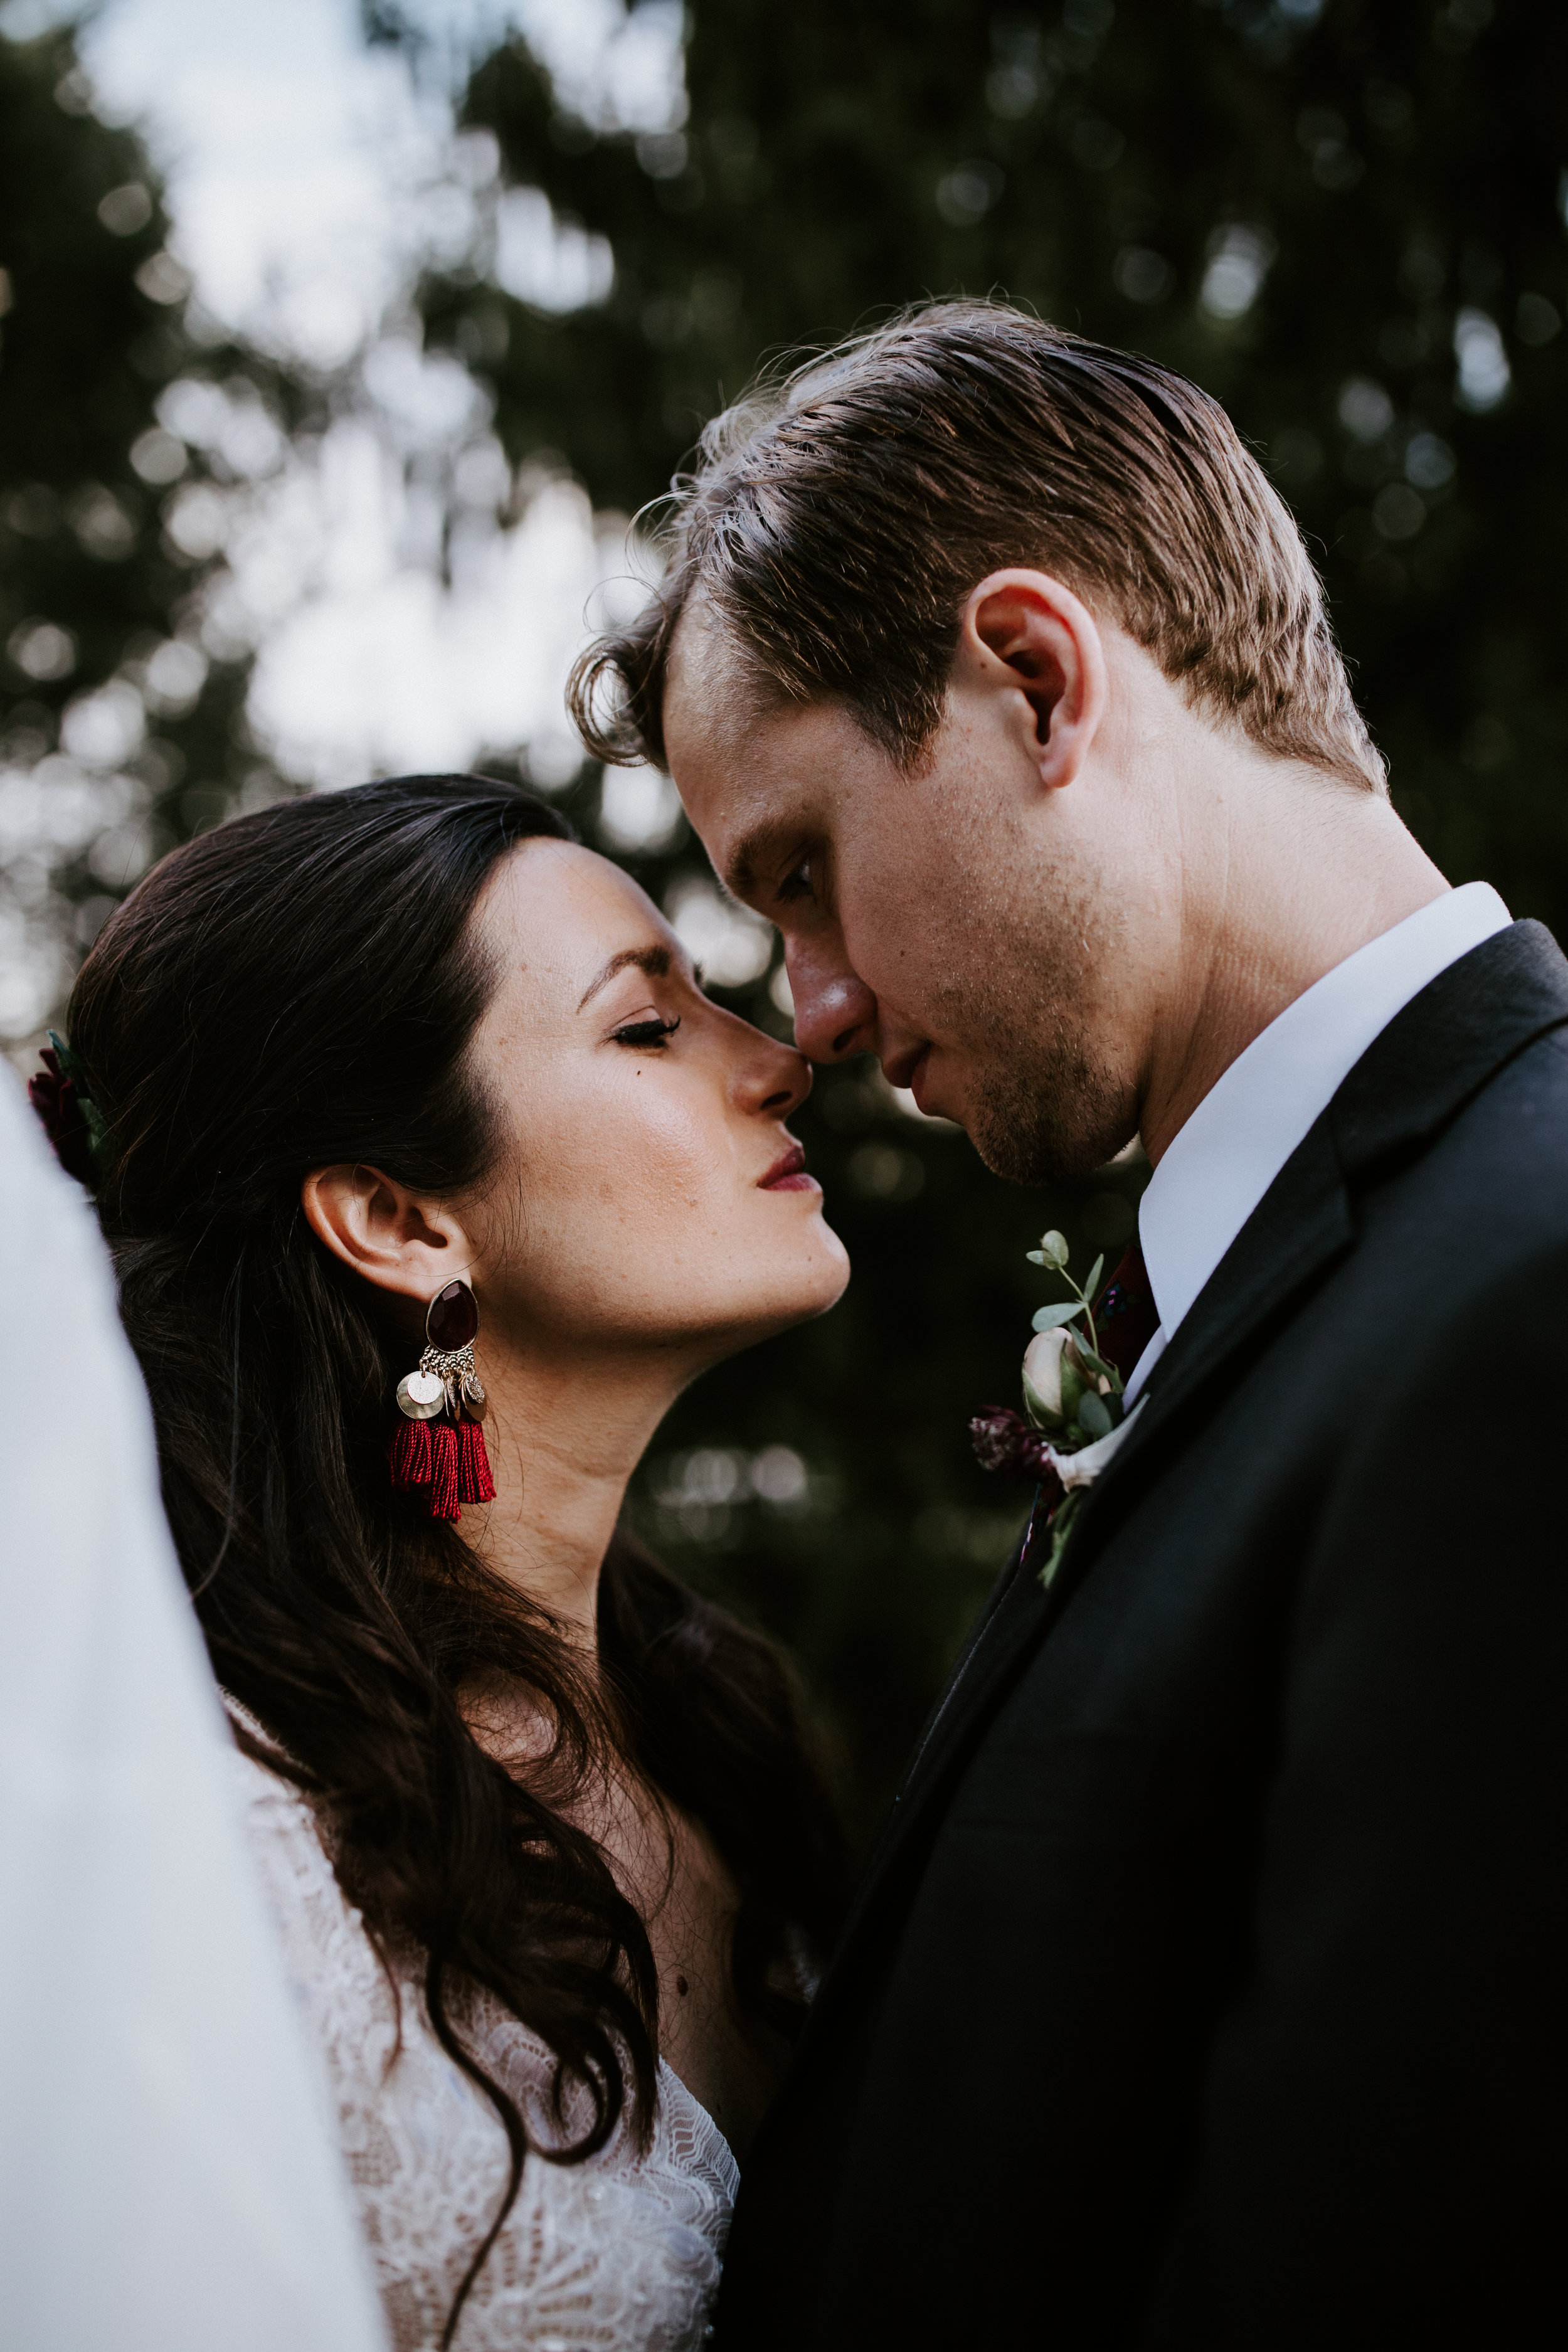 st-louis-missouri-wedding-photographer-tower-grove-park-sheldon-concert-hall-steph+phil-739.jpg